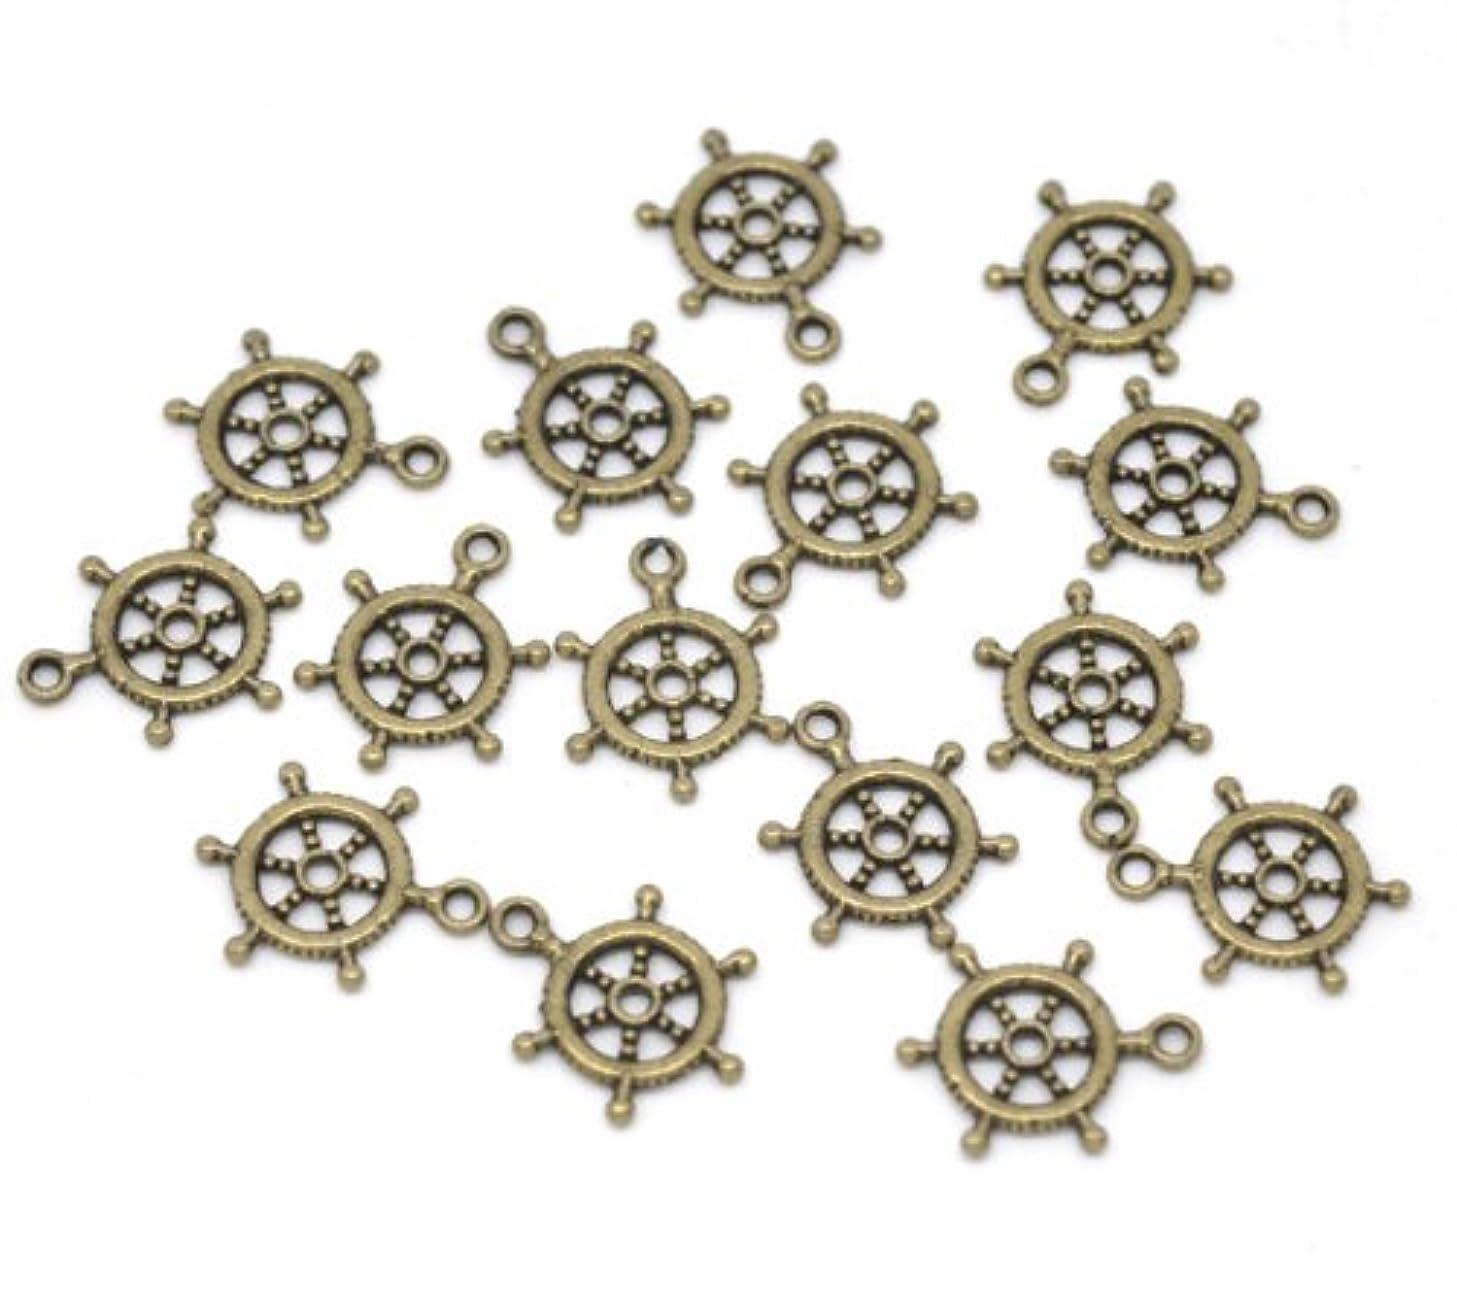 PEPPERLONELY Brand 45 Piece Antique Bronze Ship's Wheel Charms Pendants 20x15mm(3/4 x 3/5 Inch)